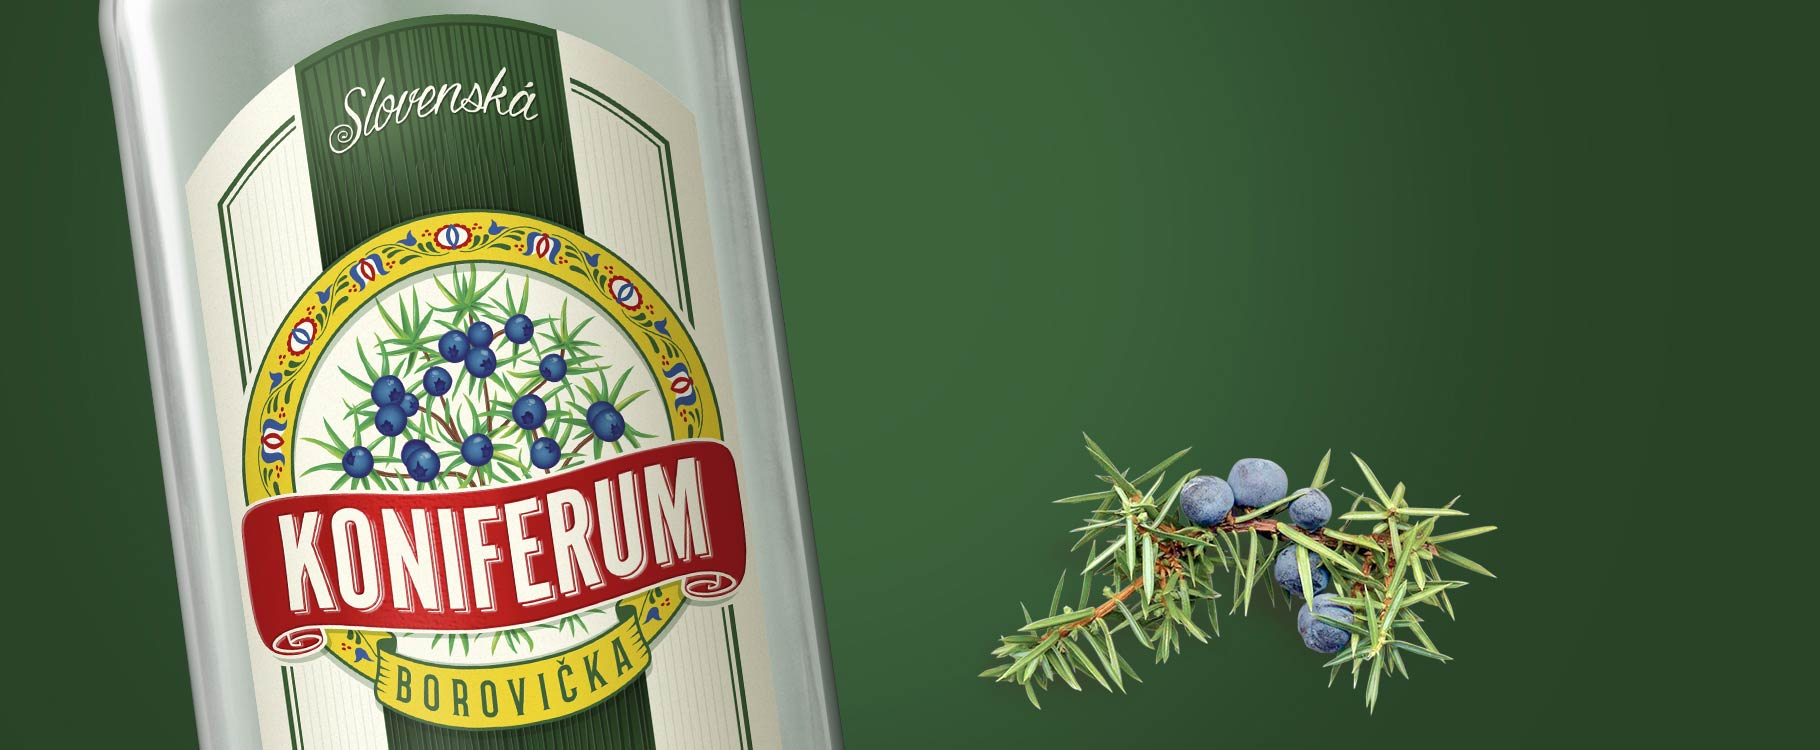 Koniferum borovička originál